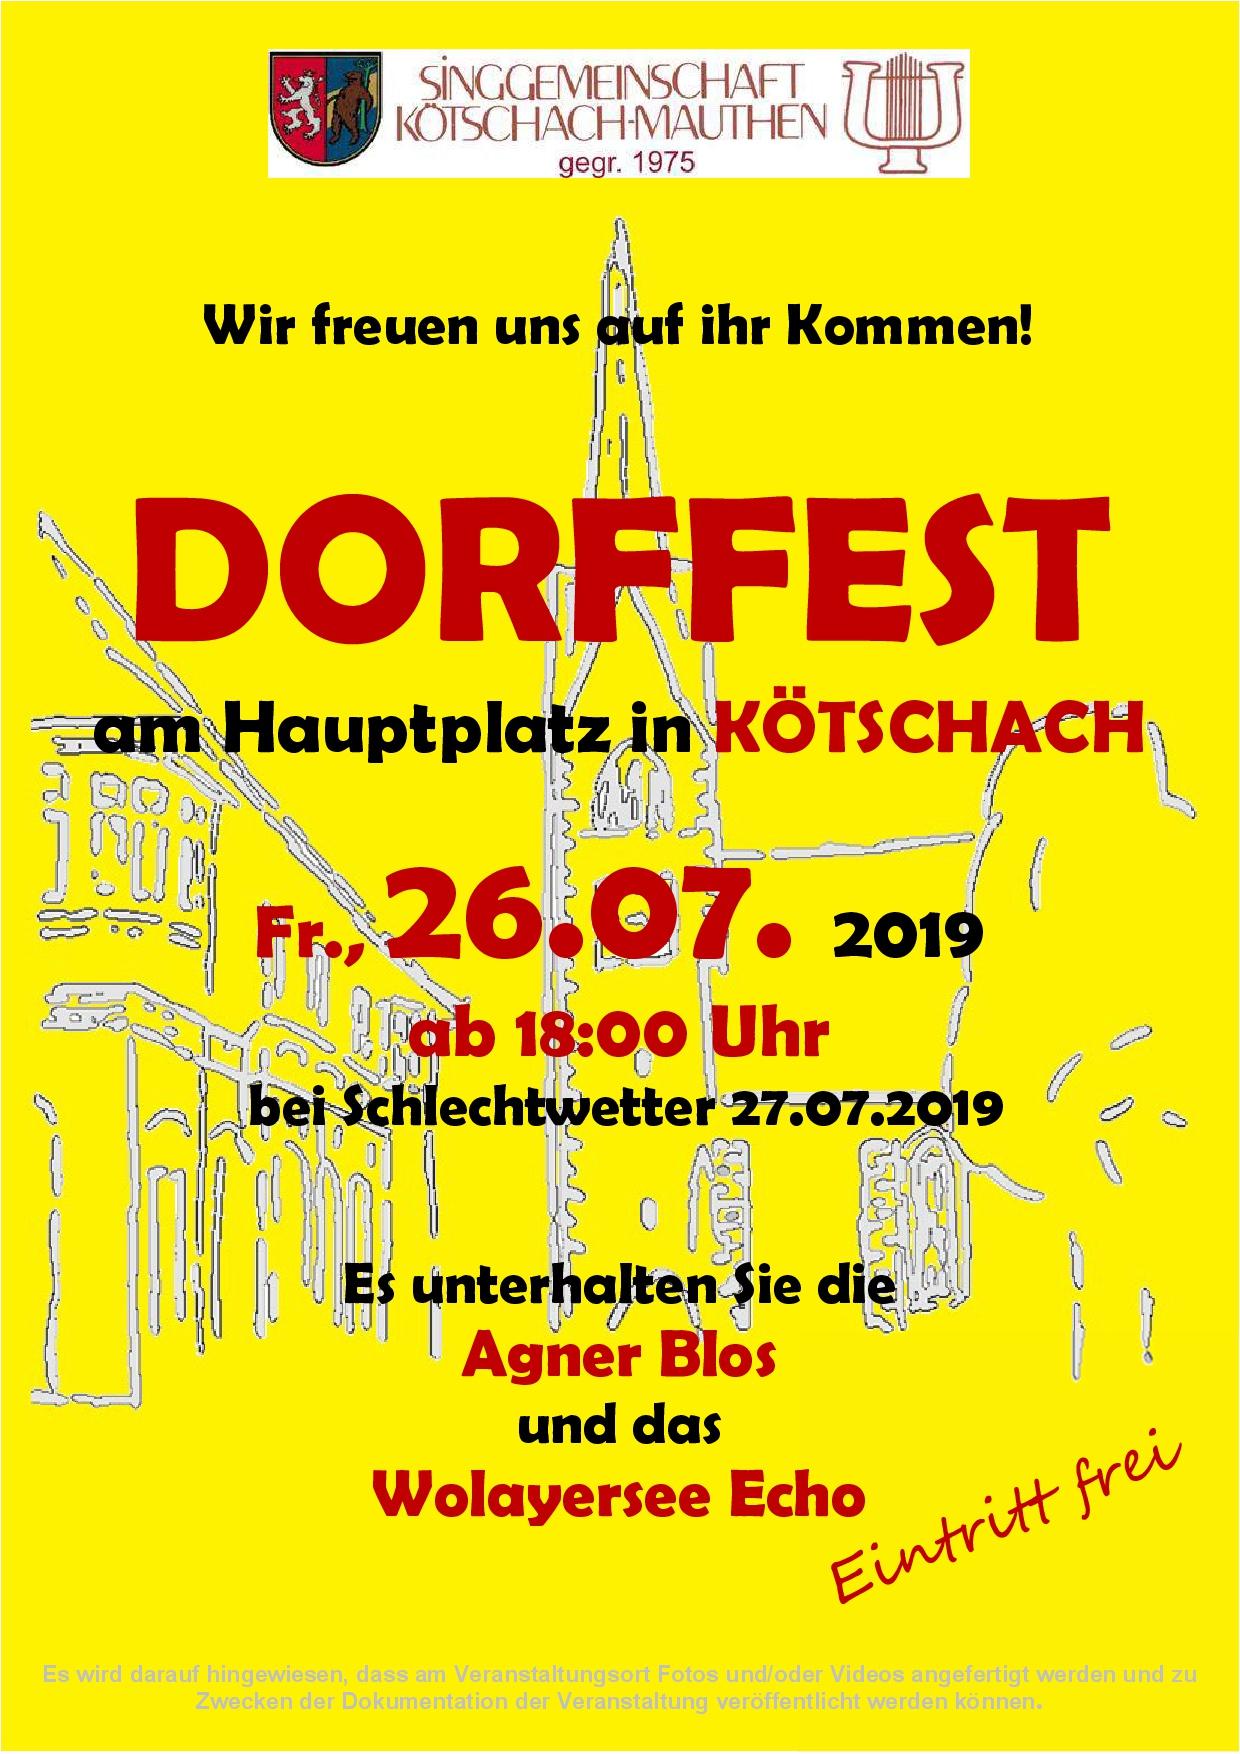 Dorffest2019.jpg - 588,56 kB